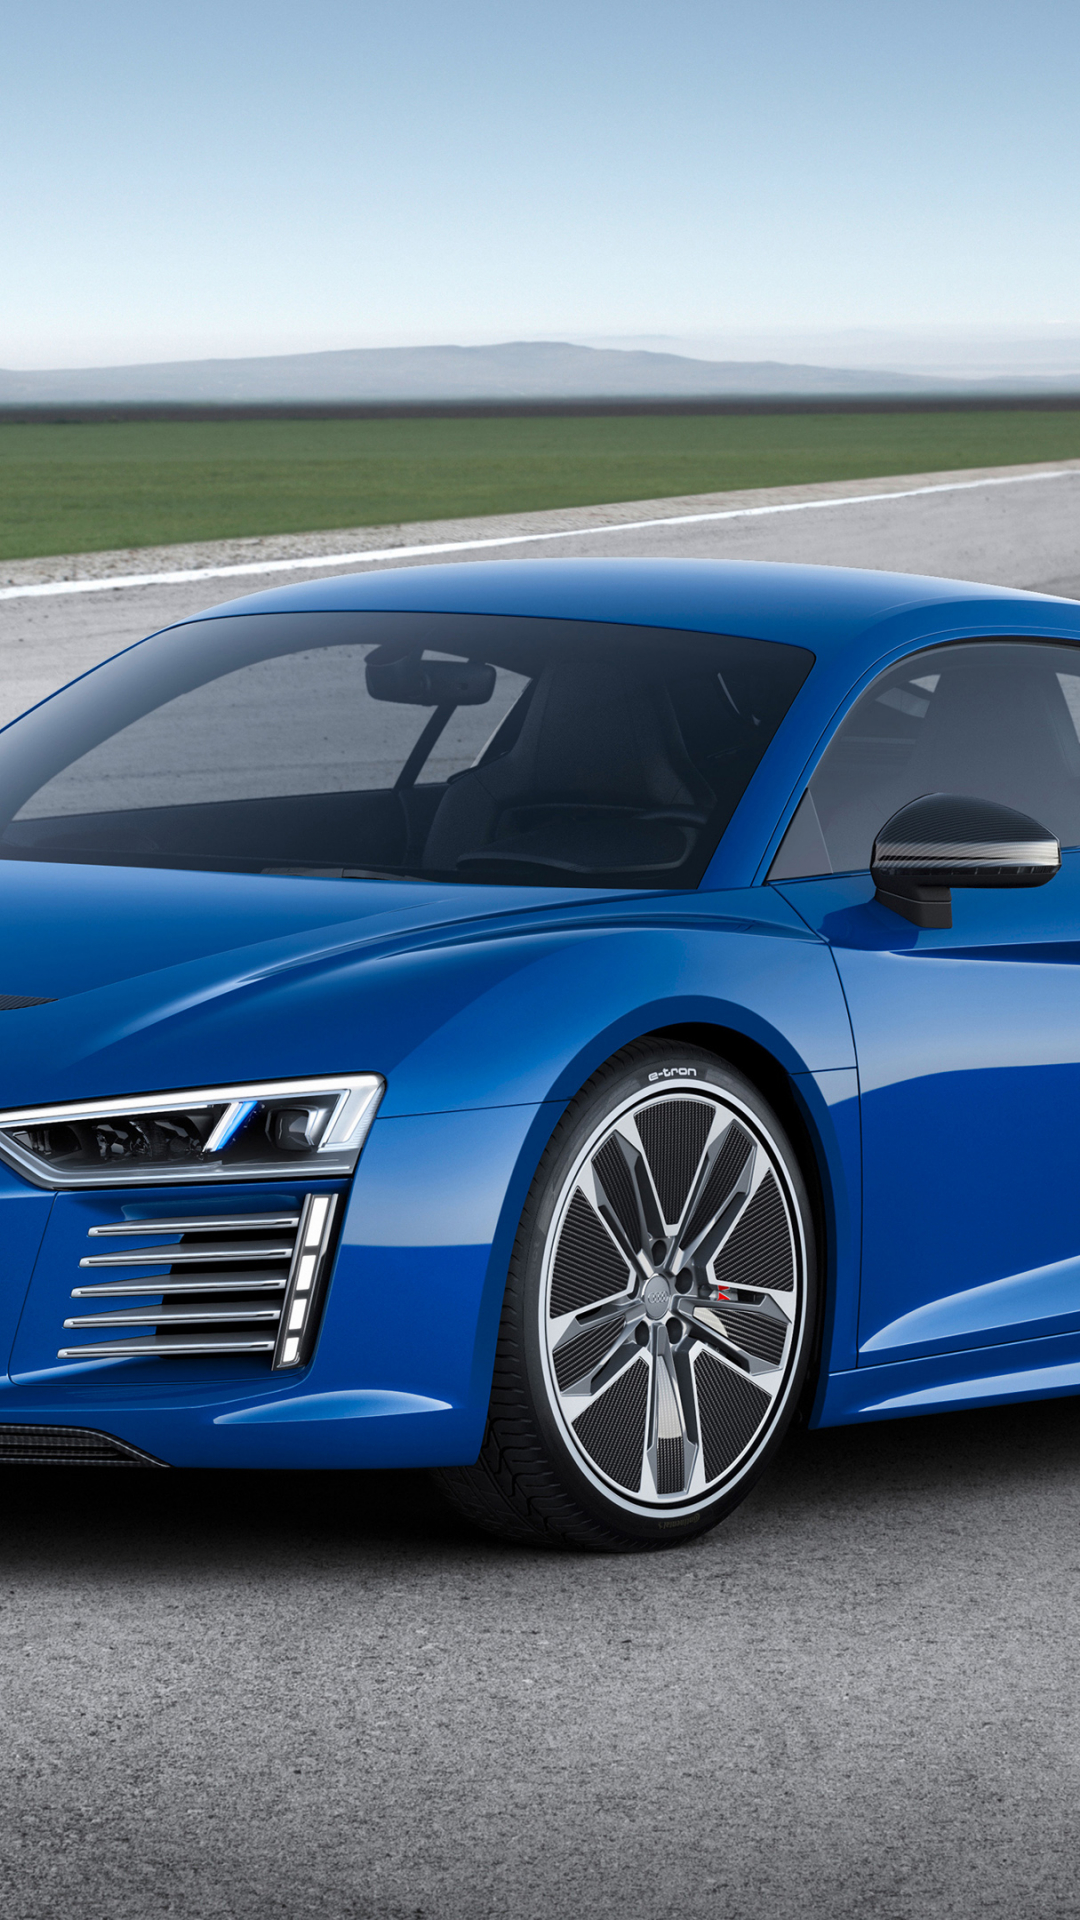 Download Audi R8 Cars Desktop Wallpapers 4k Ultra Hd 3840x2160